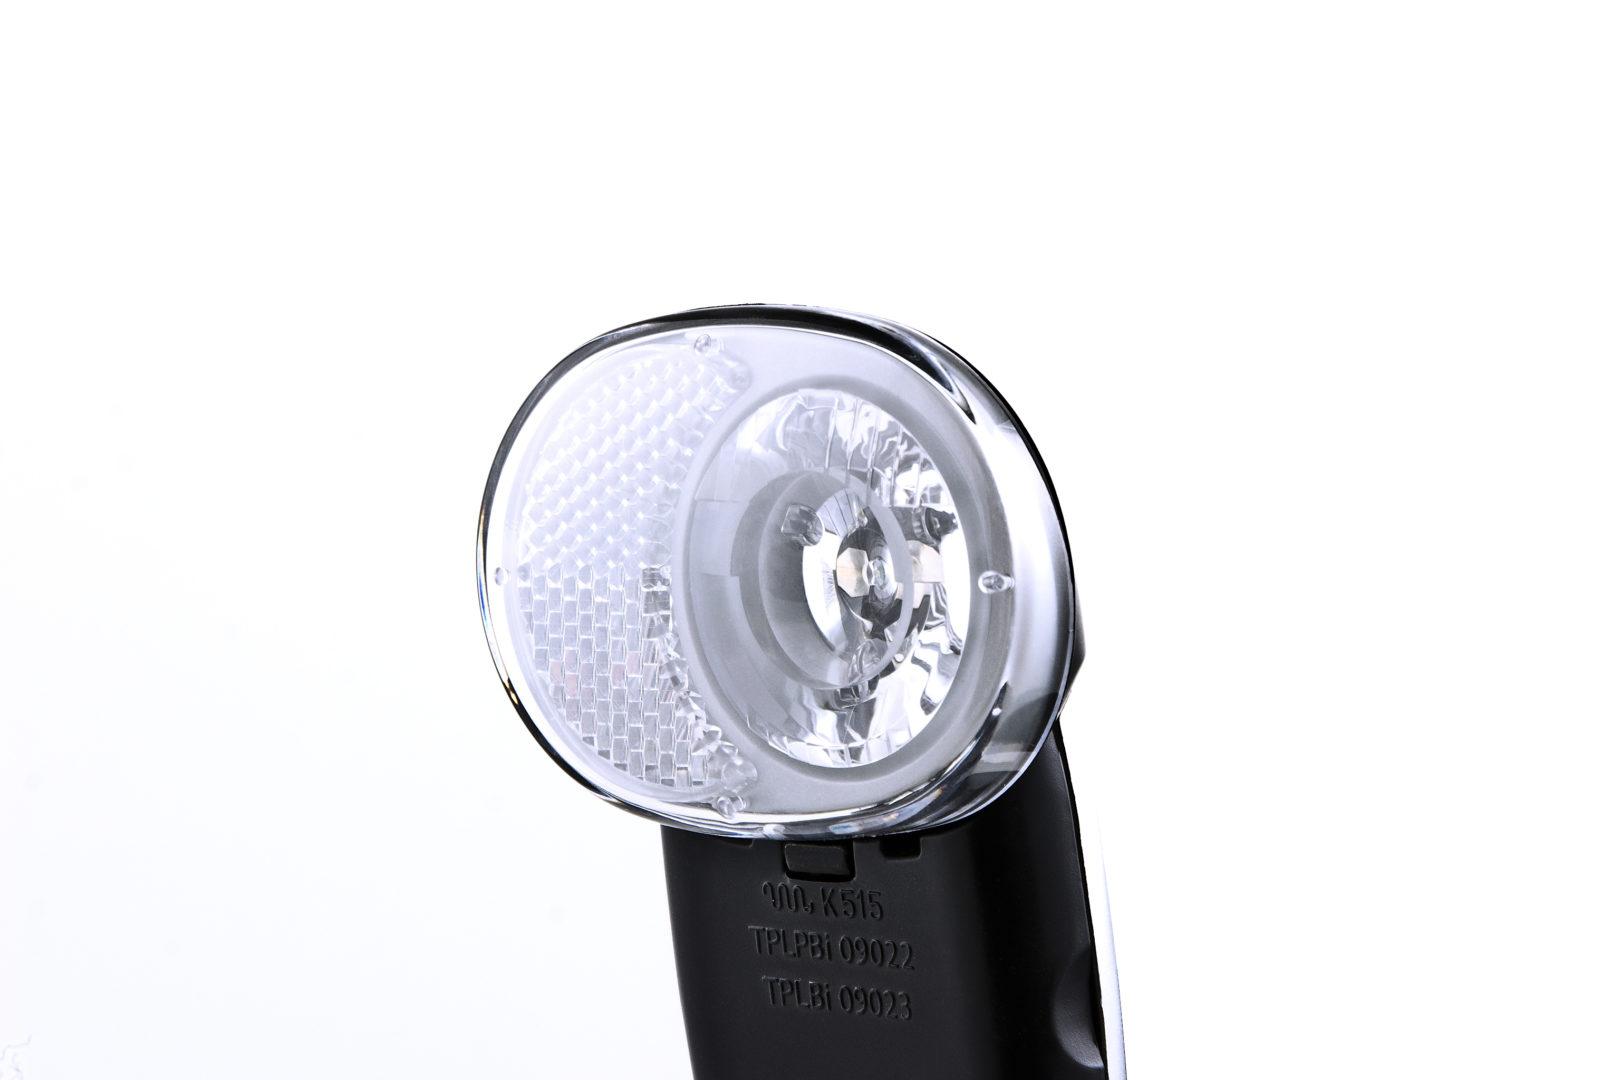 Luceo XTL lens close-up